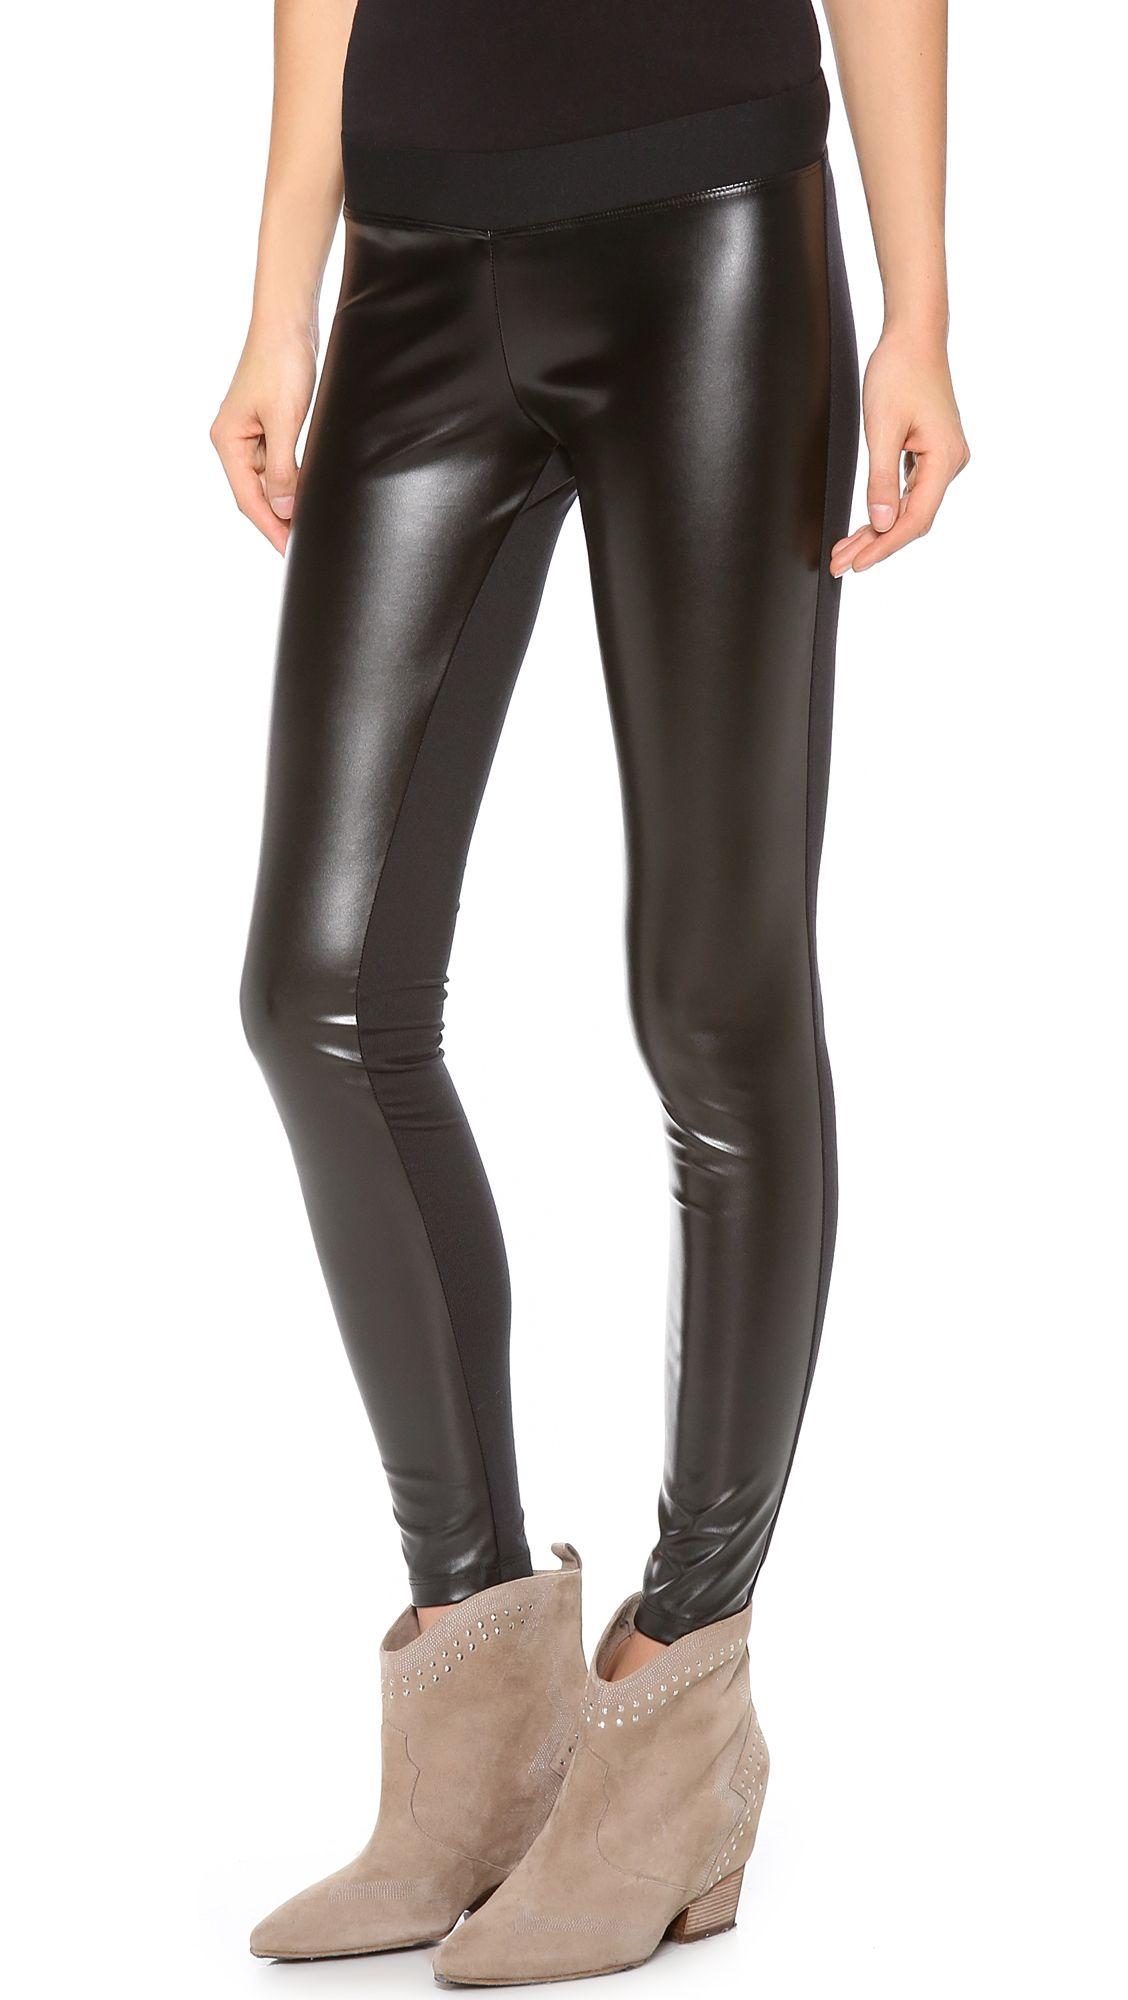 e2d636a089761 Shiny Metallic Active Legging | swag | Maternity leggings, Leggings ...